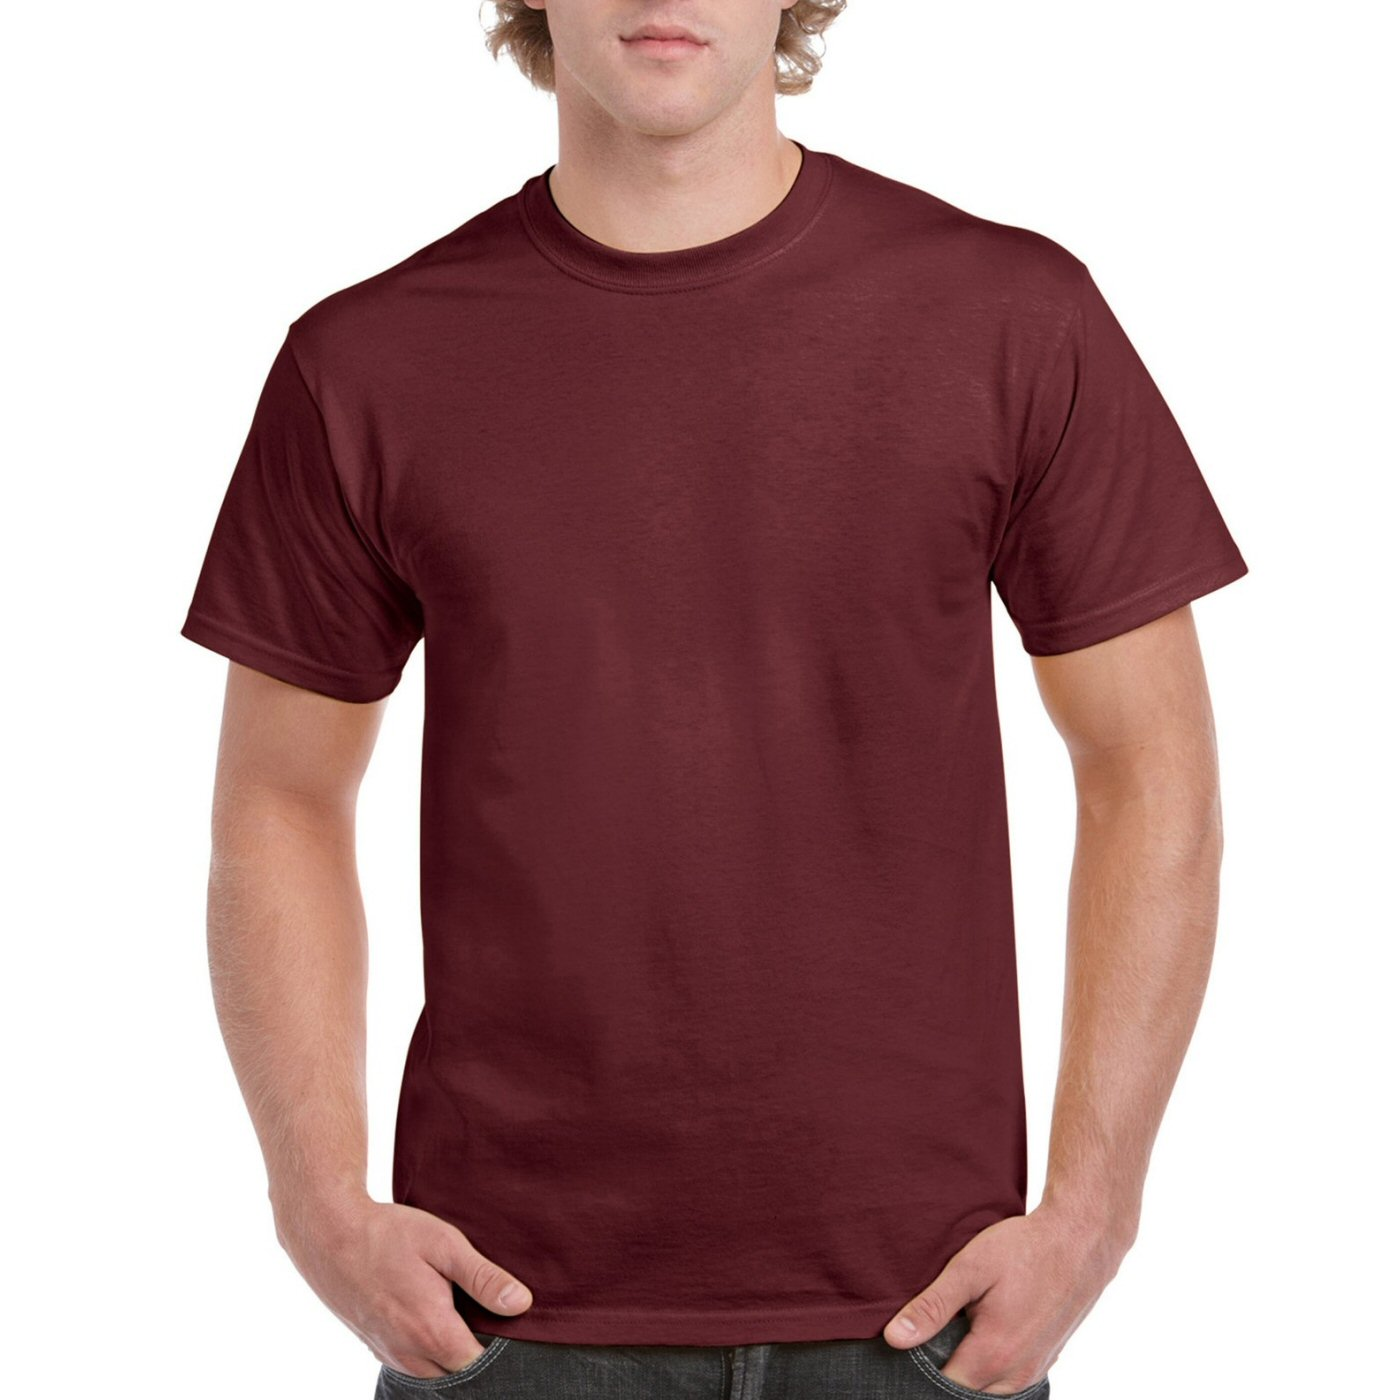 Maroon plain round neck 100 cotton t shirt for men for Maroon t shirt for men